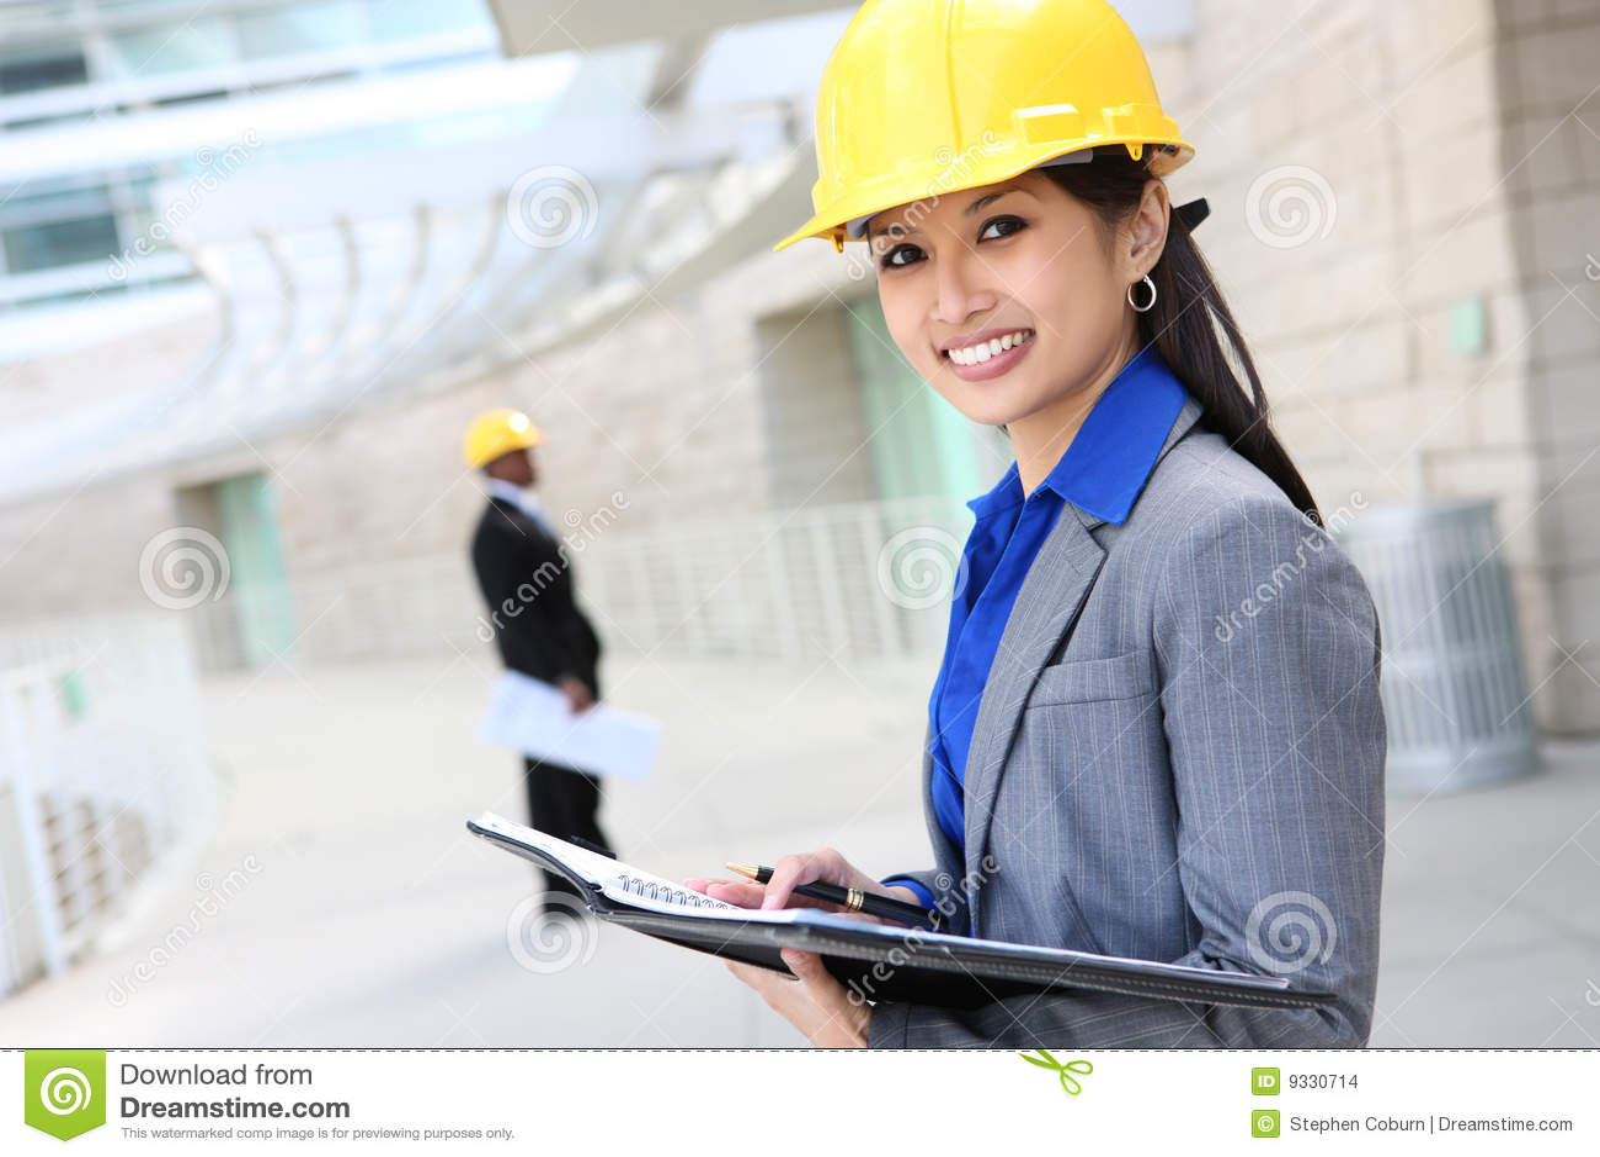 asian woman architect stock images image 9330714 team clip art images tea clip art free